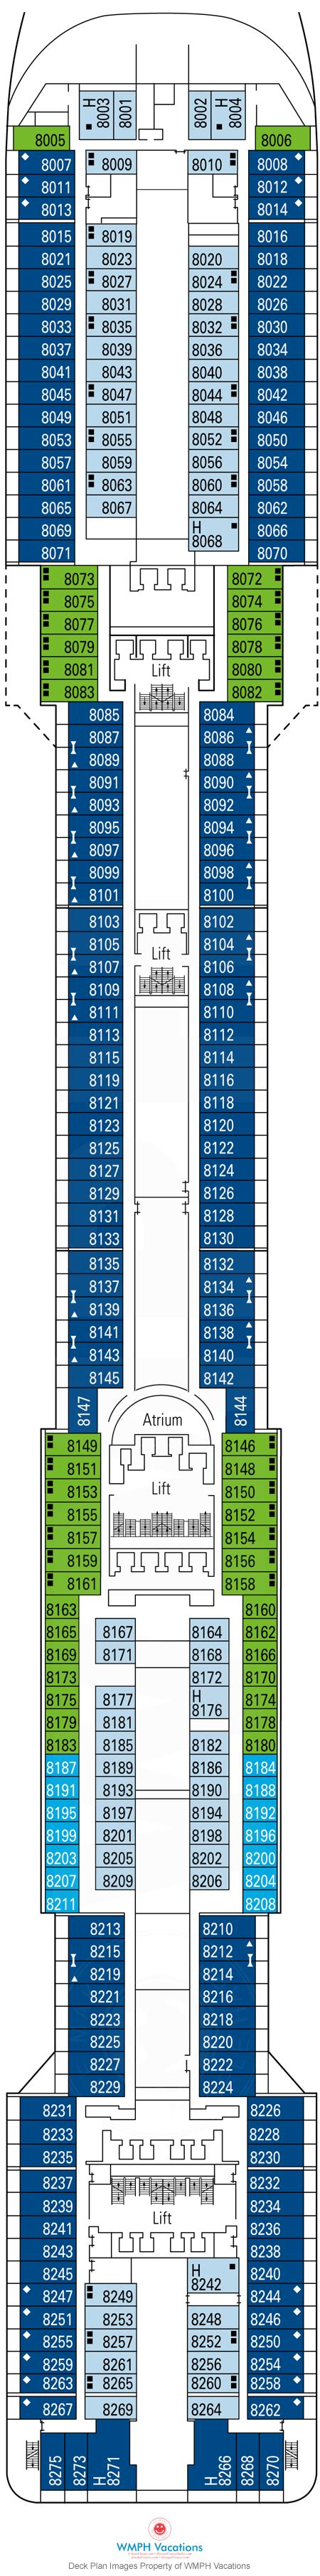 Msc Divina Deck Plan 11 by Msc Divina Deck Plans Deck 8 What S On Deck 8 On Msc